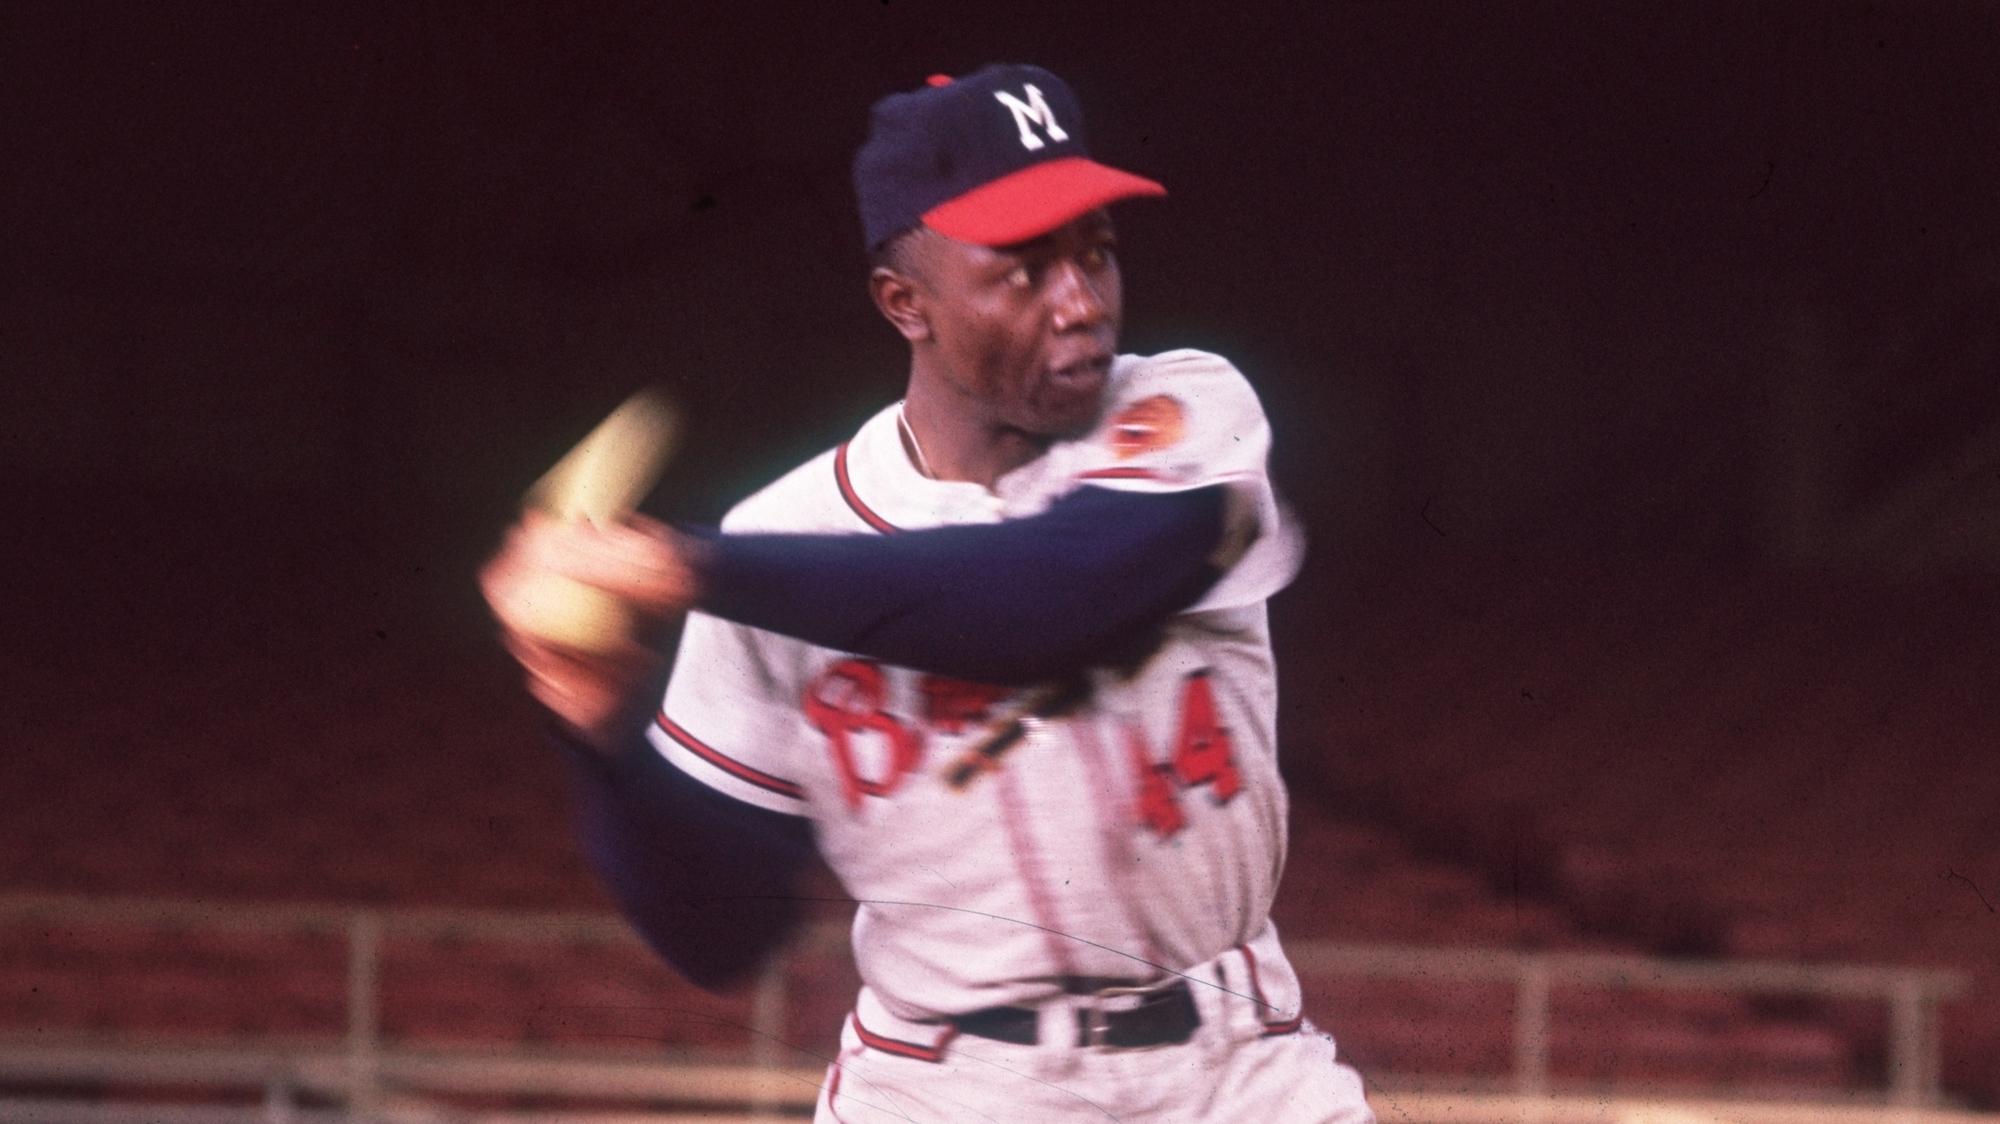 Hank Aaron, baseball's legendary slugger, dies at 86 | MPR News